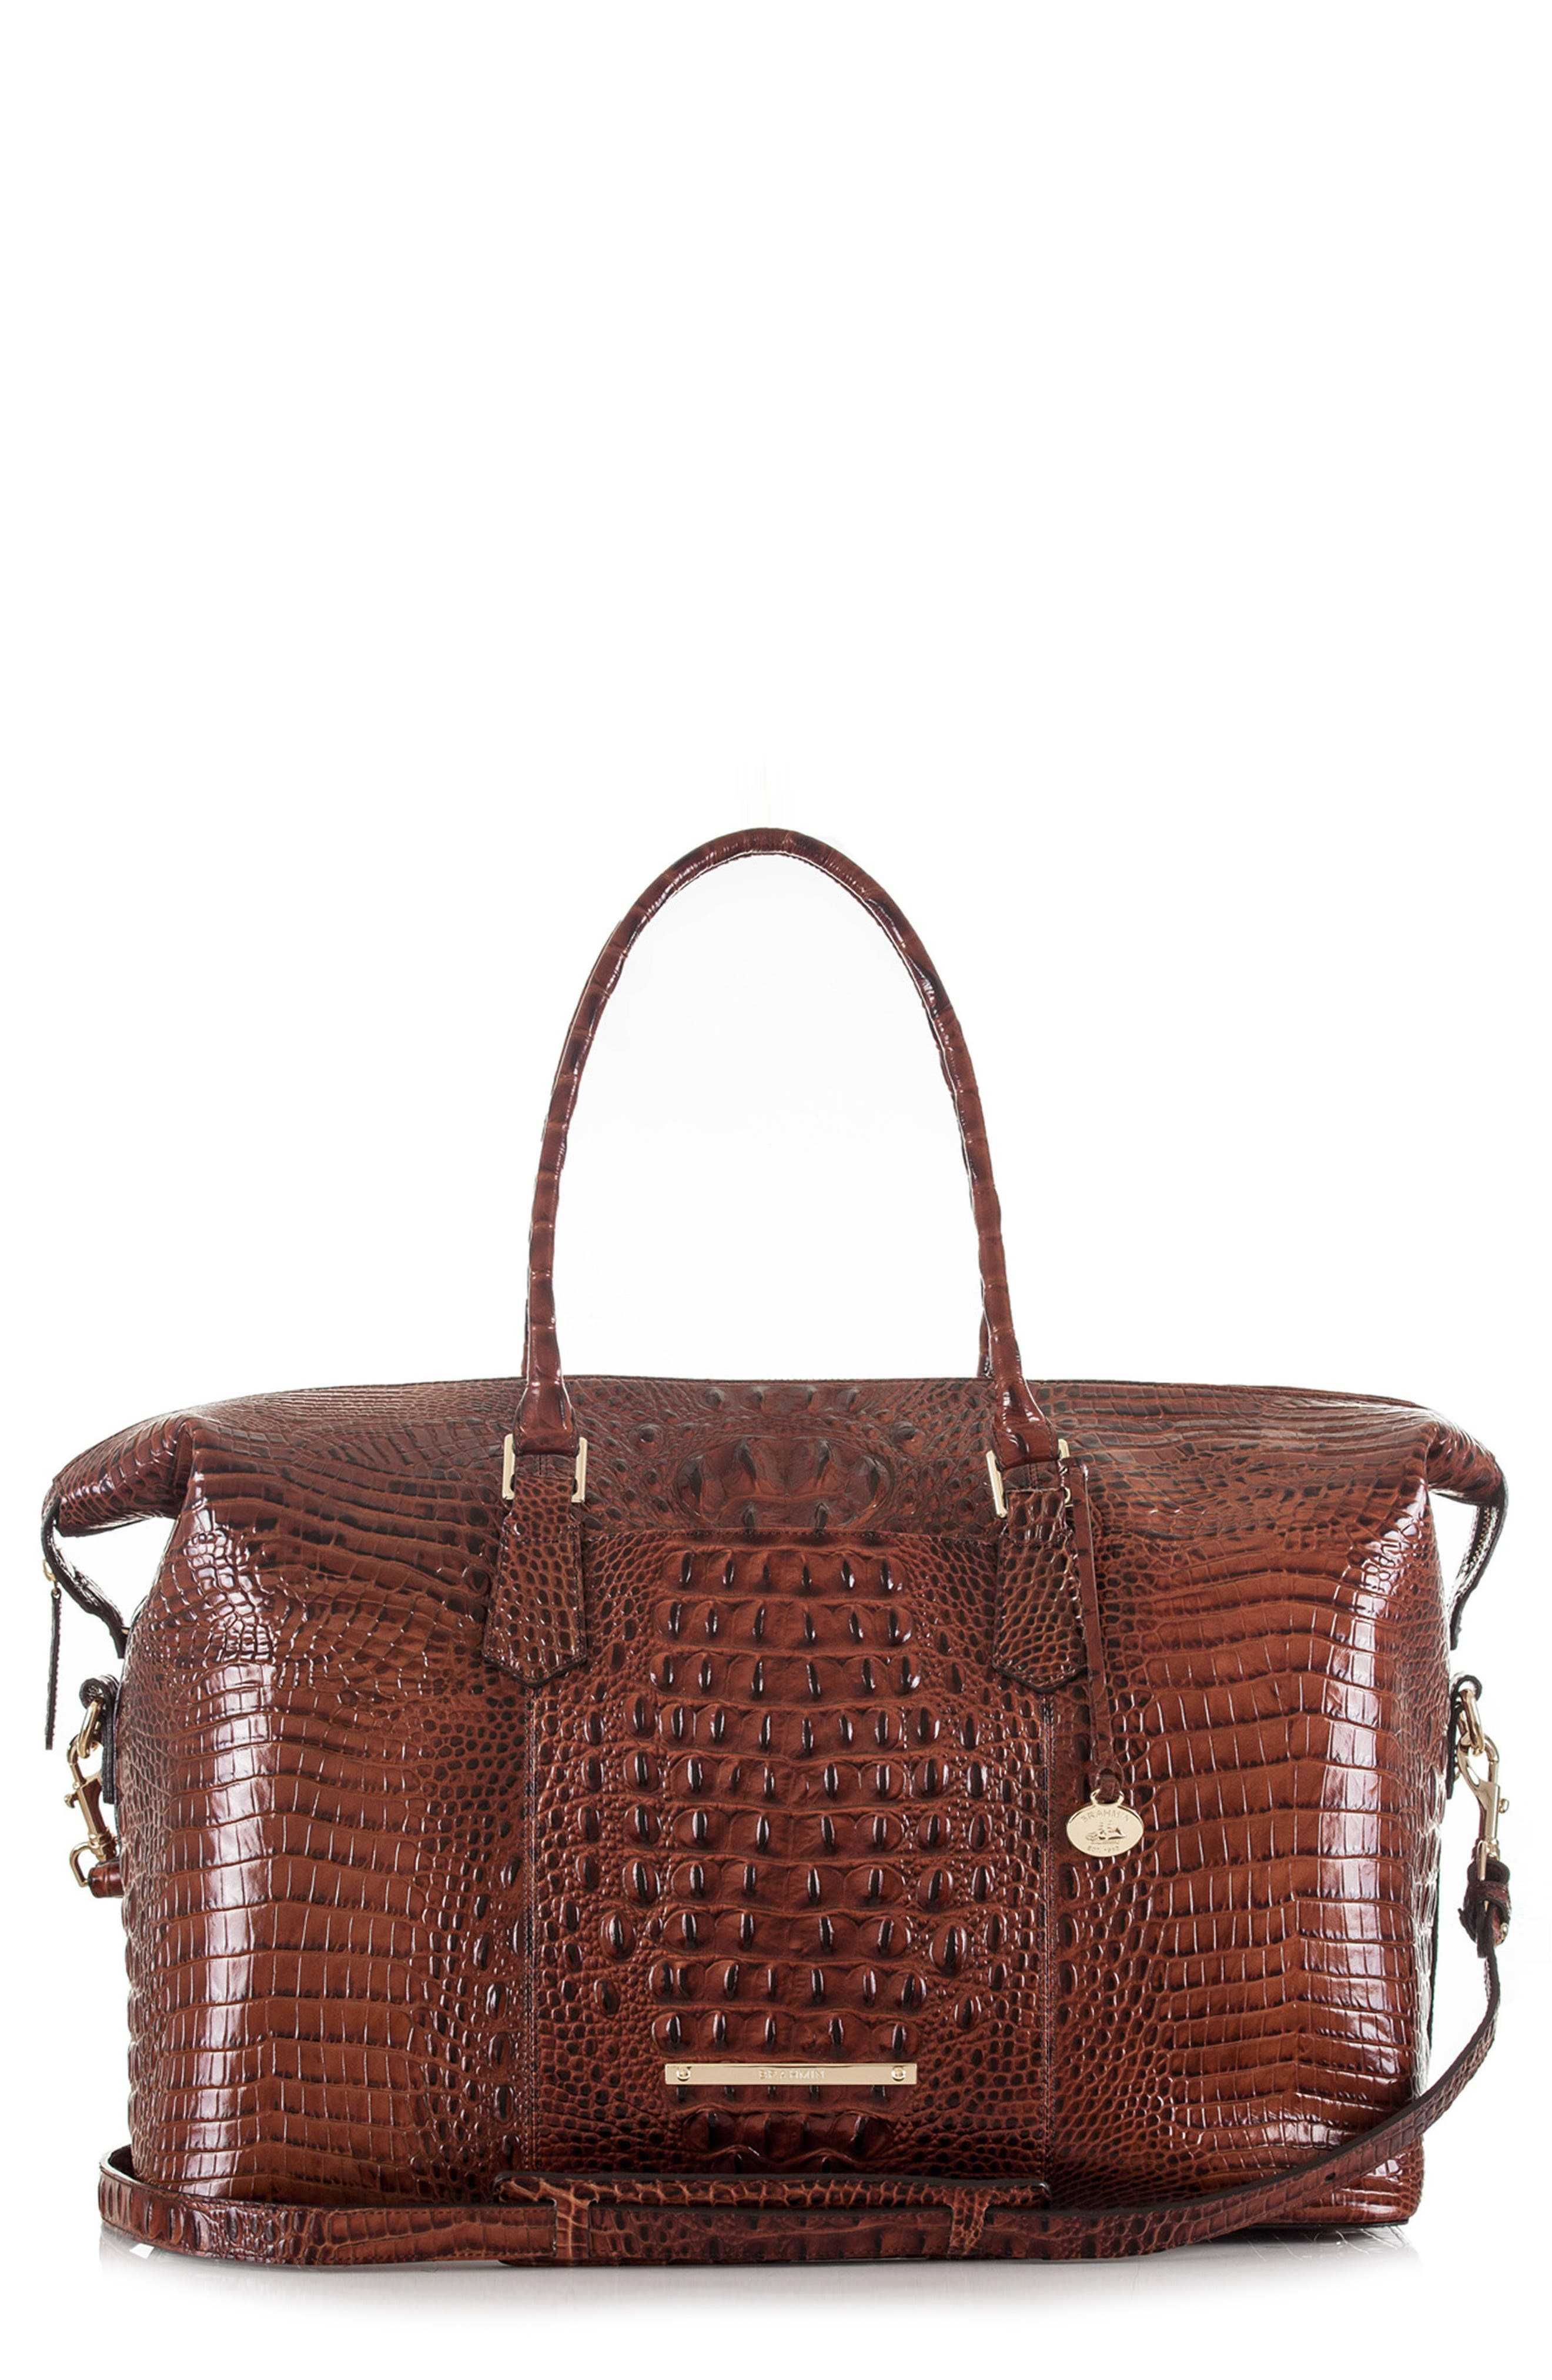 Brahmin 'Duxbury' Leather Travel Bag